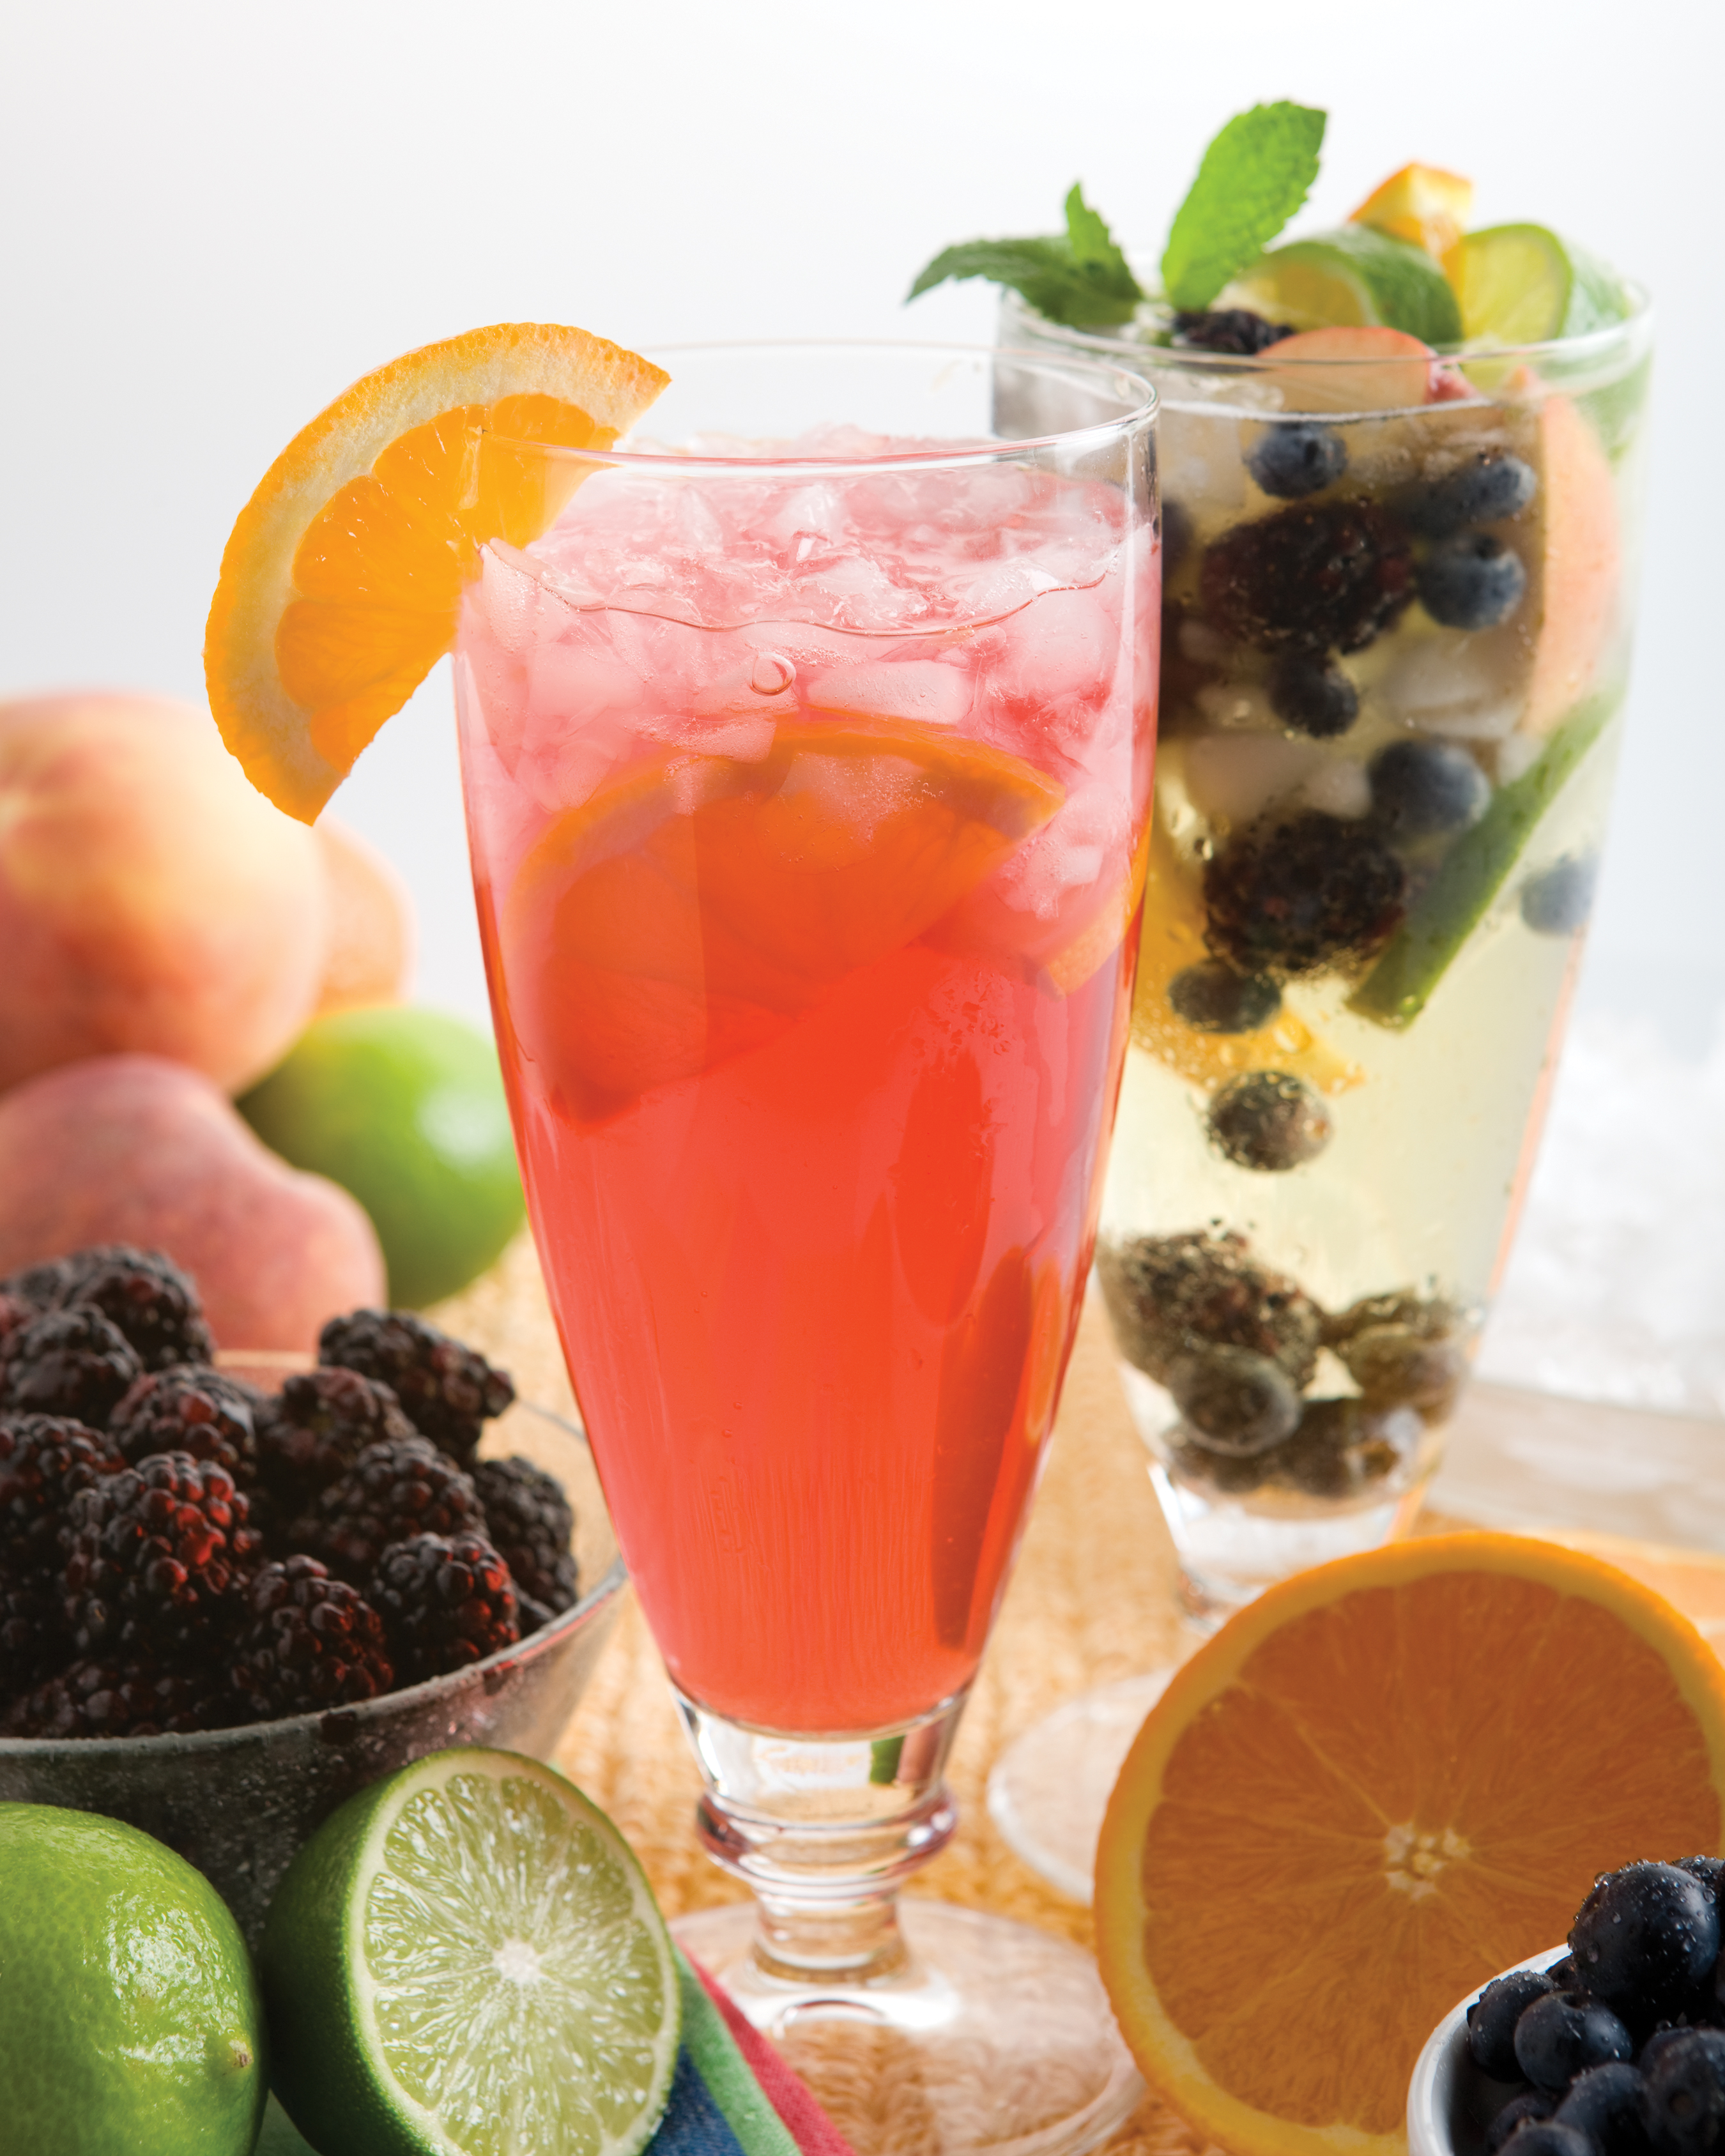 Cranberry Orange Spritzer | Recipes & Meals - Stop&Shop